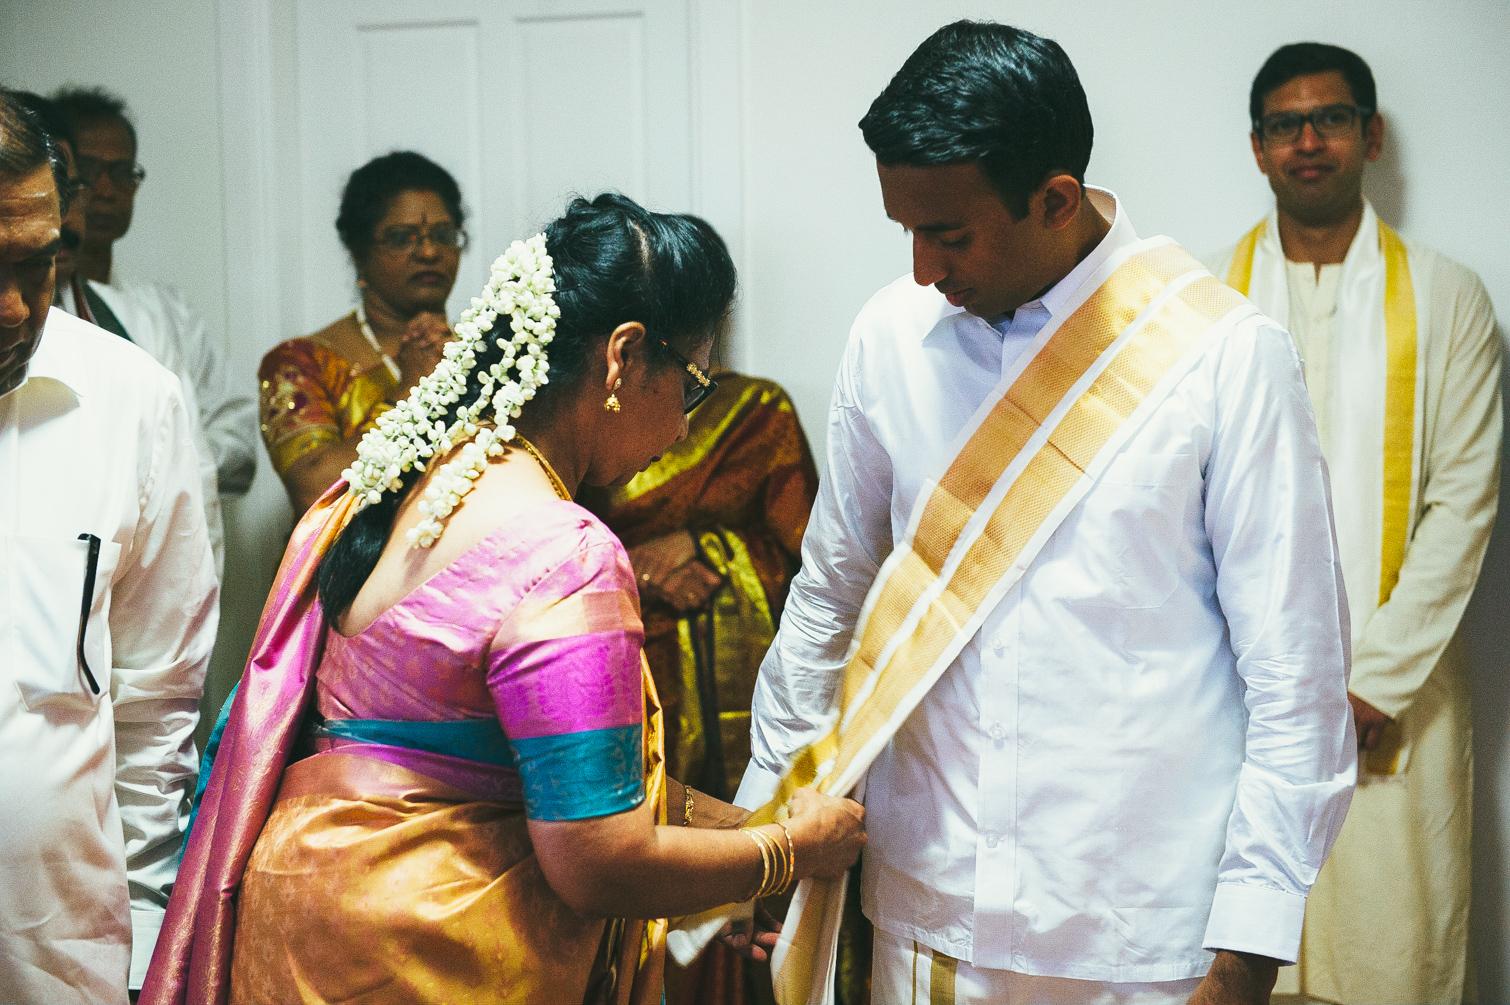 sri venkateswara temple wedding photography 8.jpg